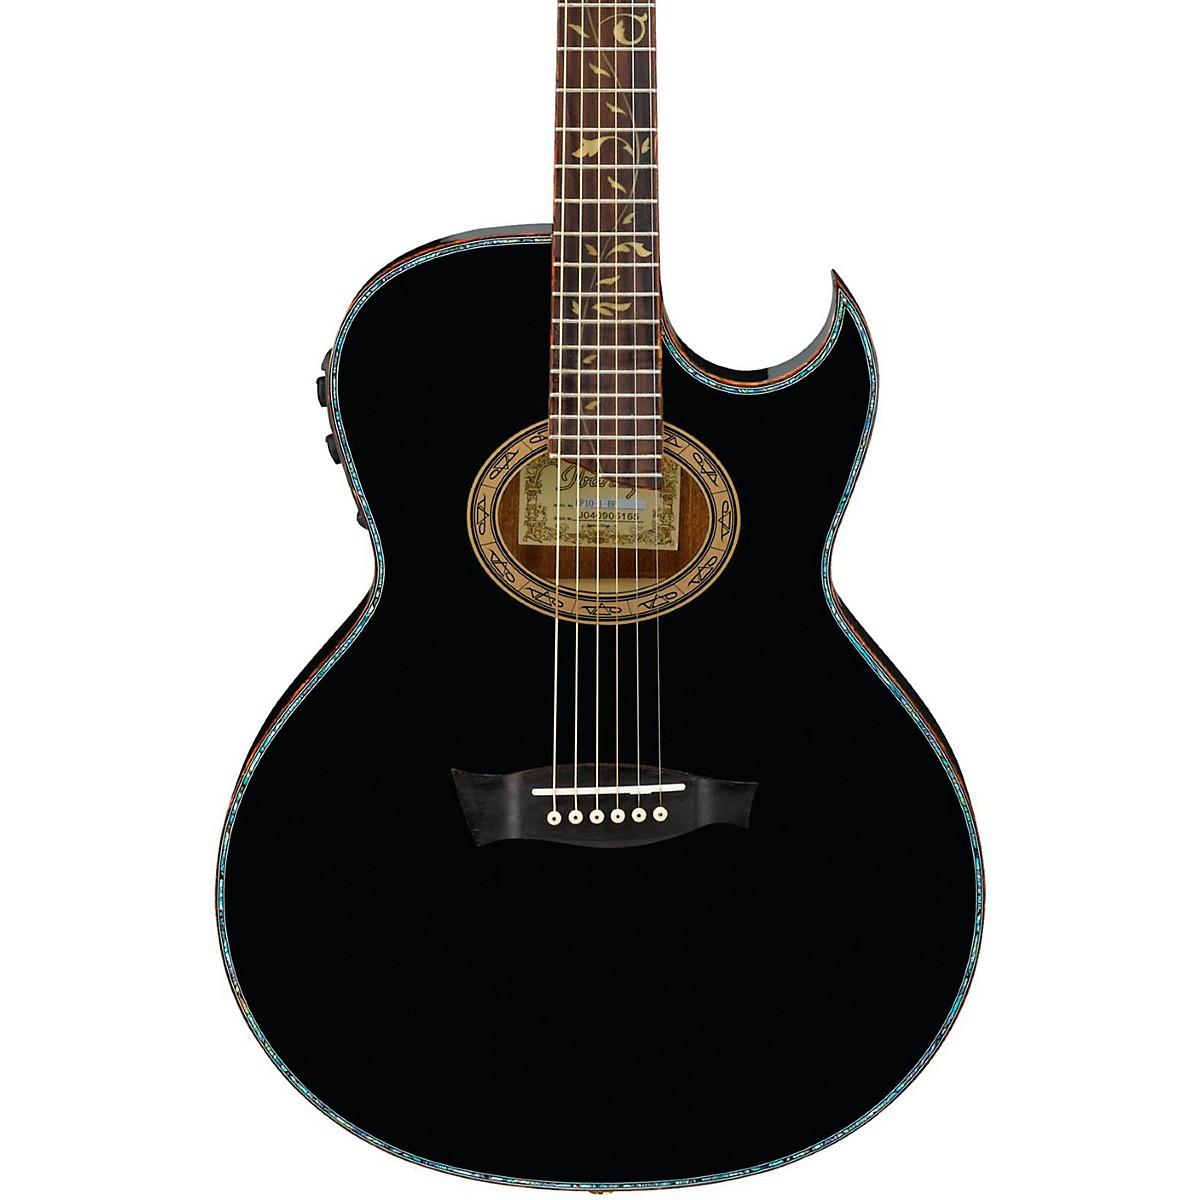 Ibanez Euphoria Steve Vai All Solid Wood Signature Acoustic-Electric Guitar